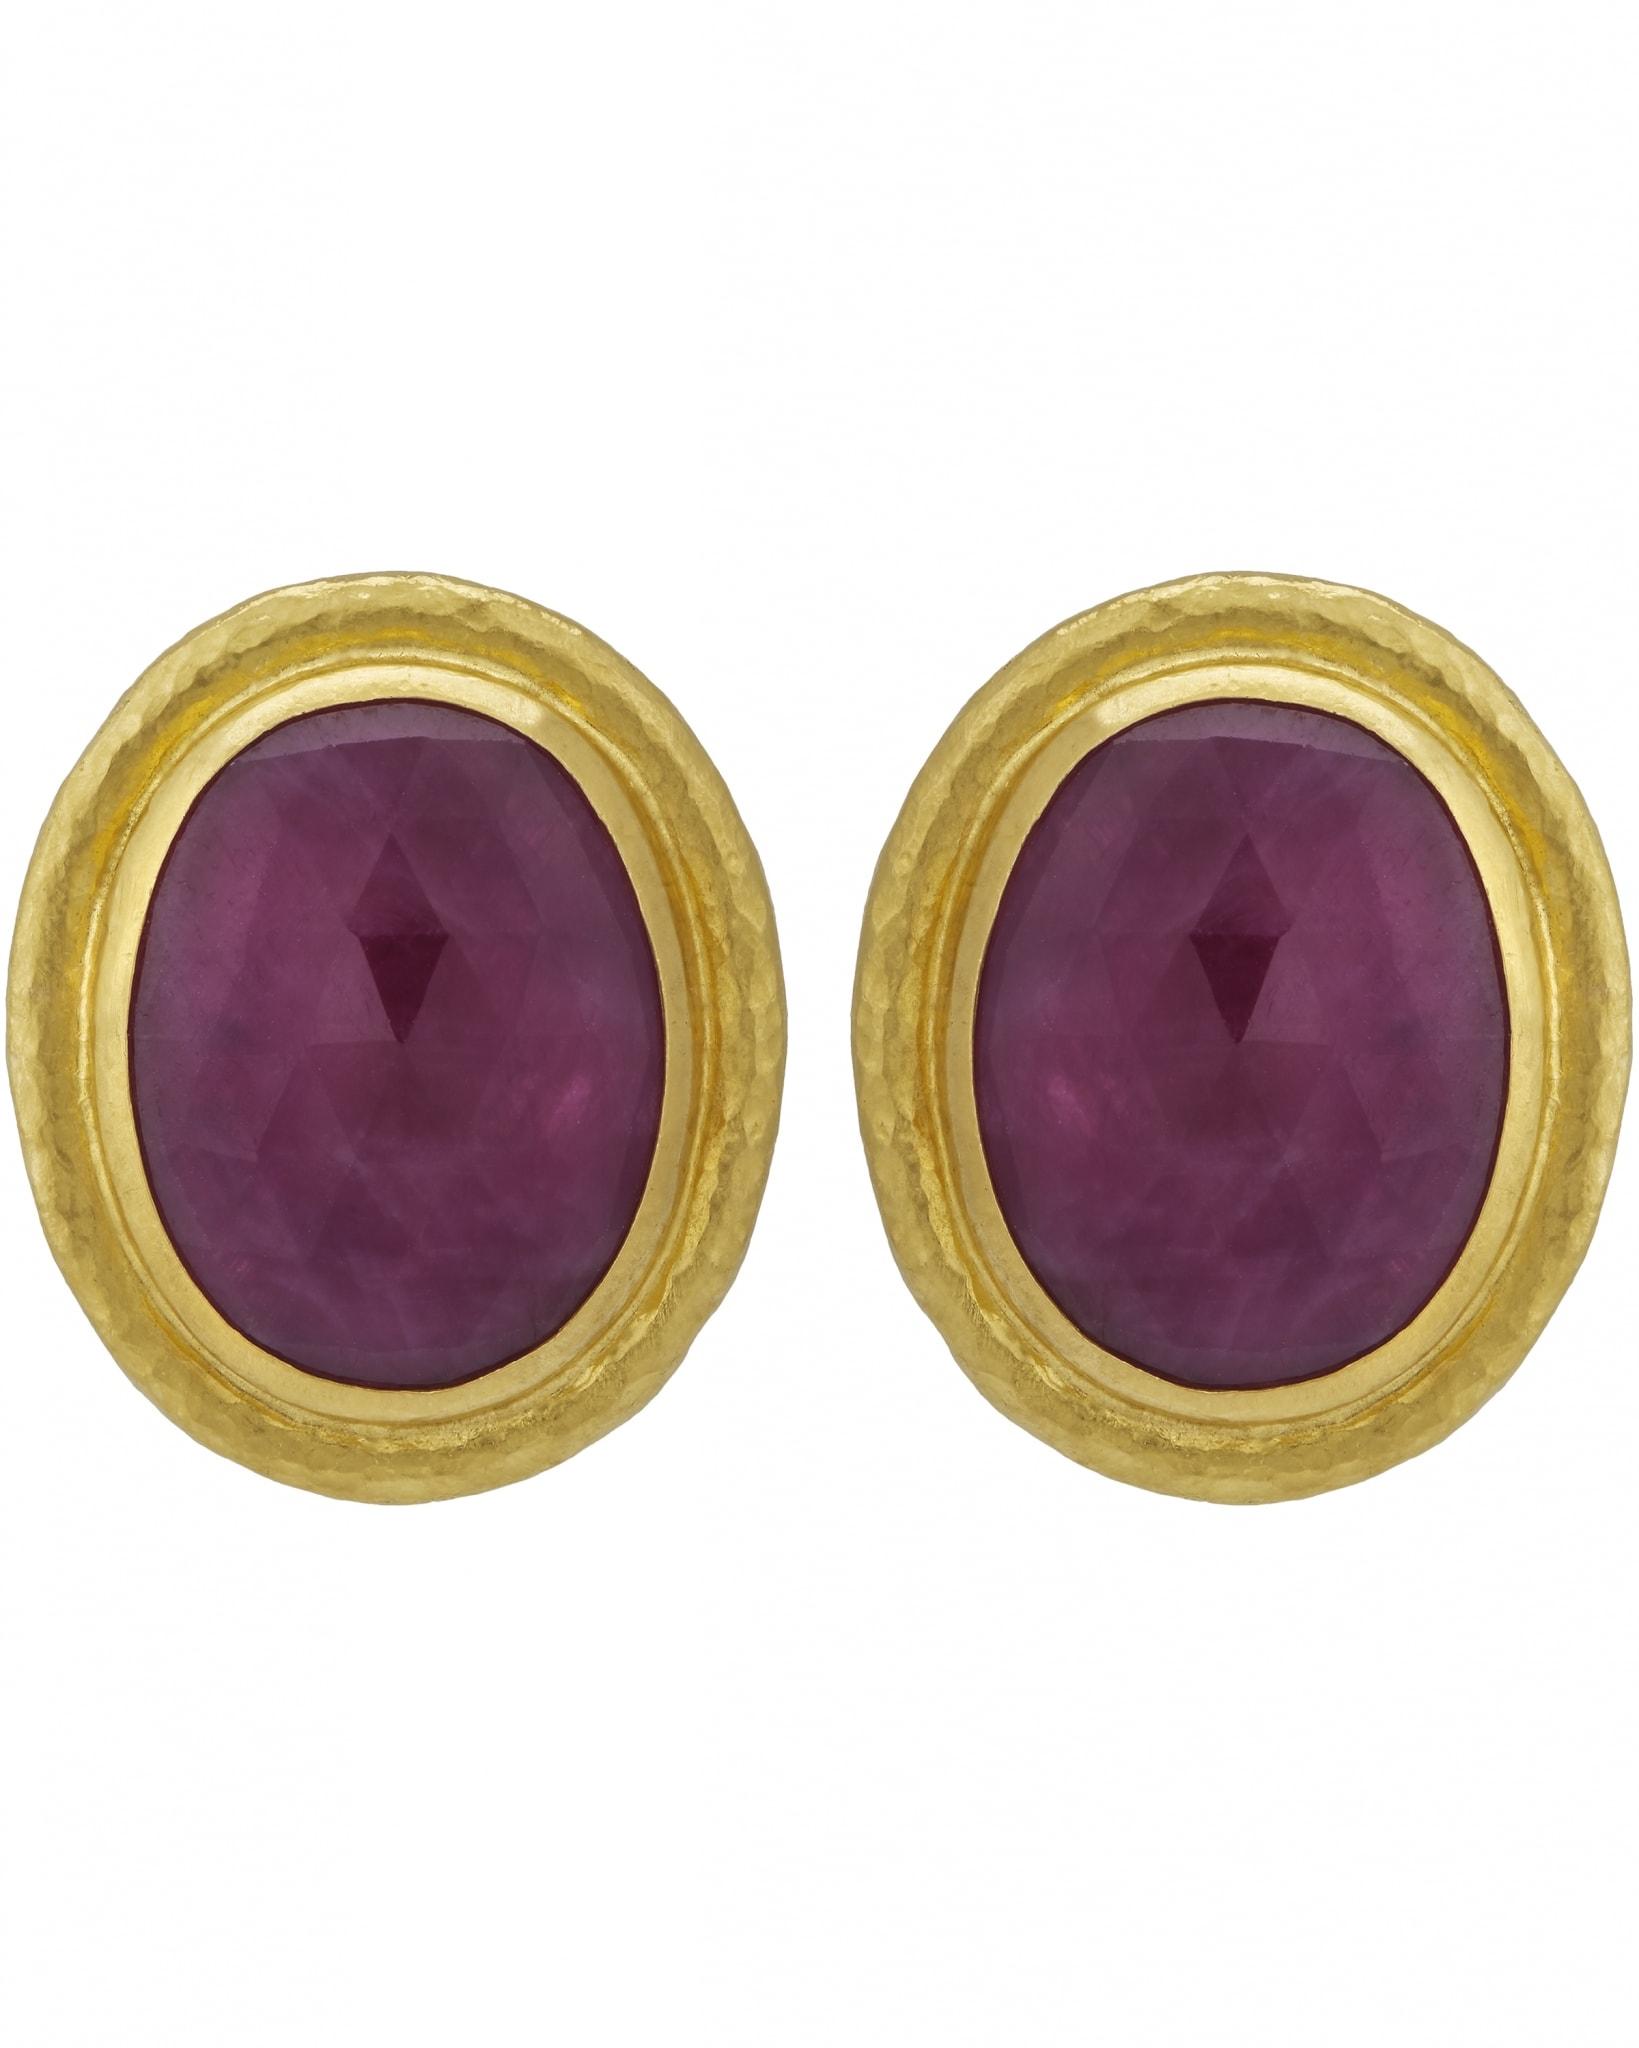 GURHAN – Earrings, 24k Gold with Rosecut Ruby